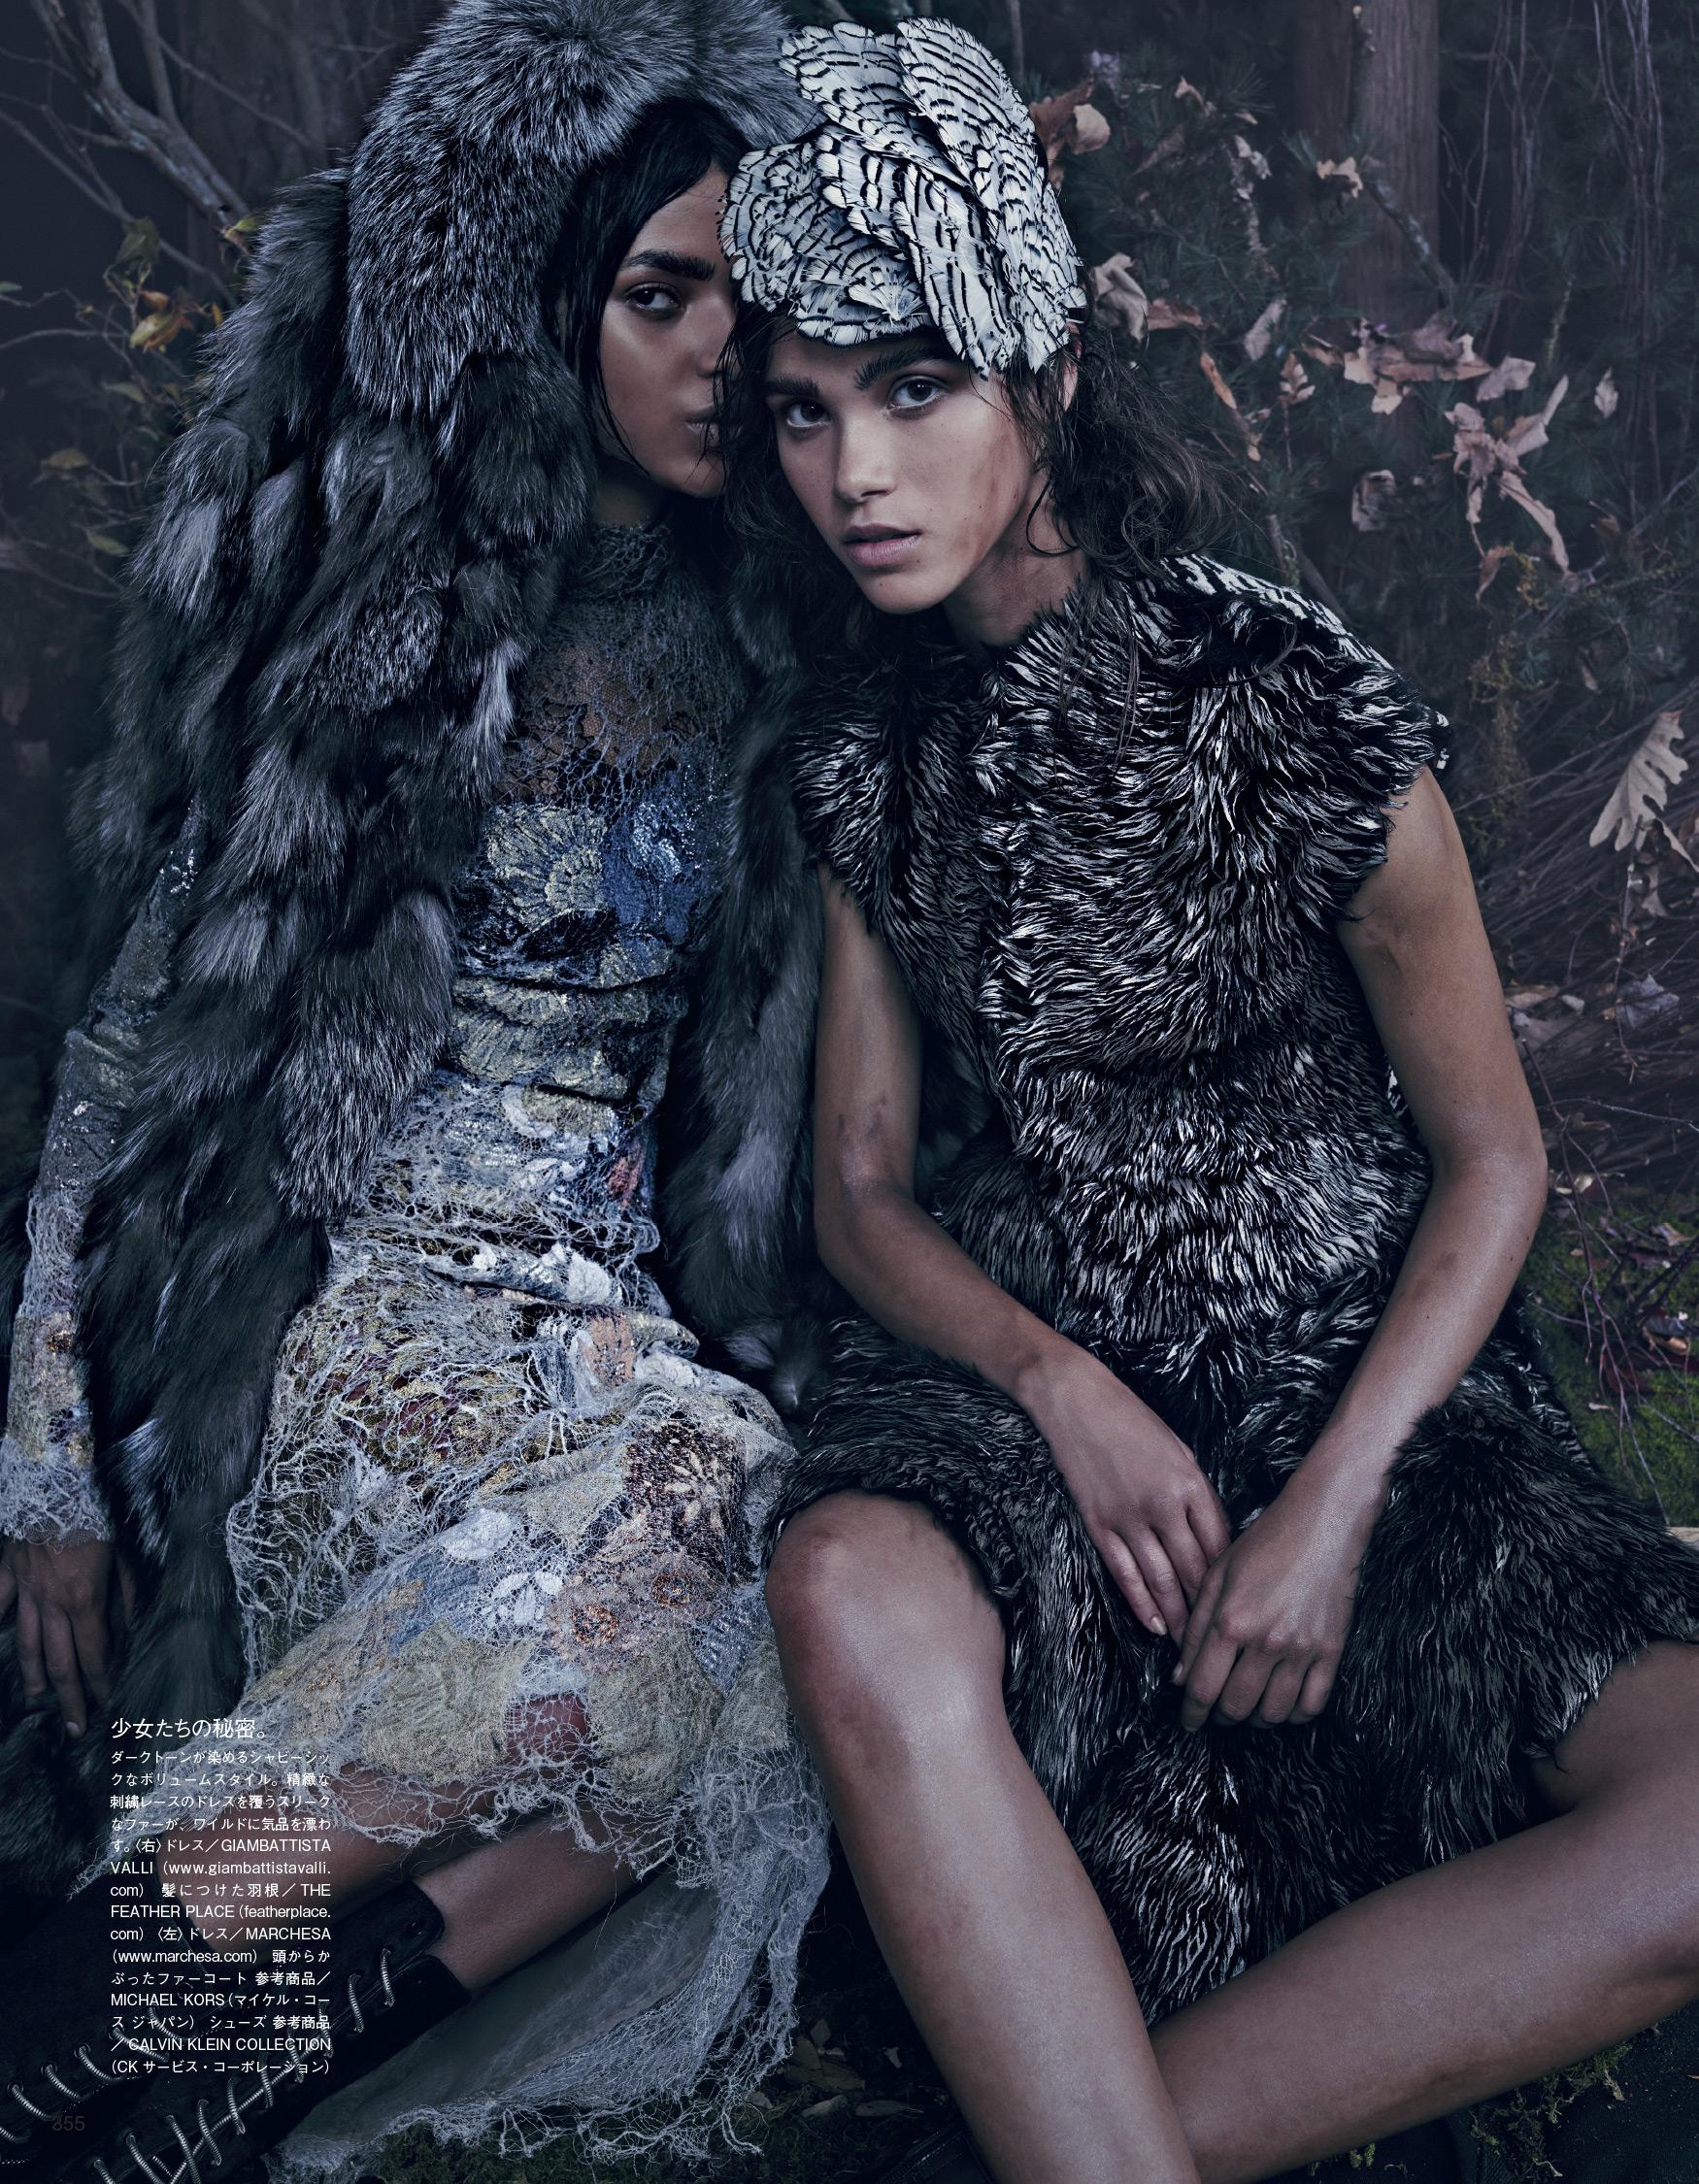 Giovanna-Battaglia-Into-The-Woods-Vogue-Japan-Emma-Summerton-05.jpg